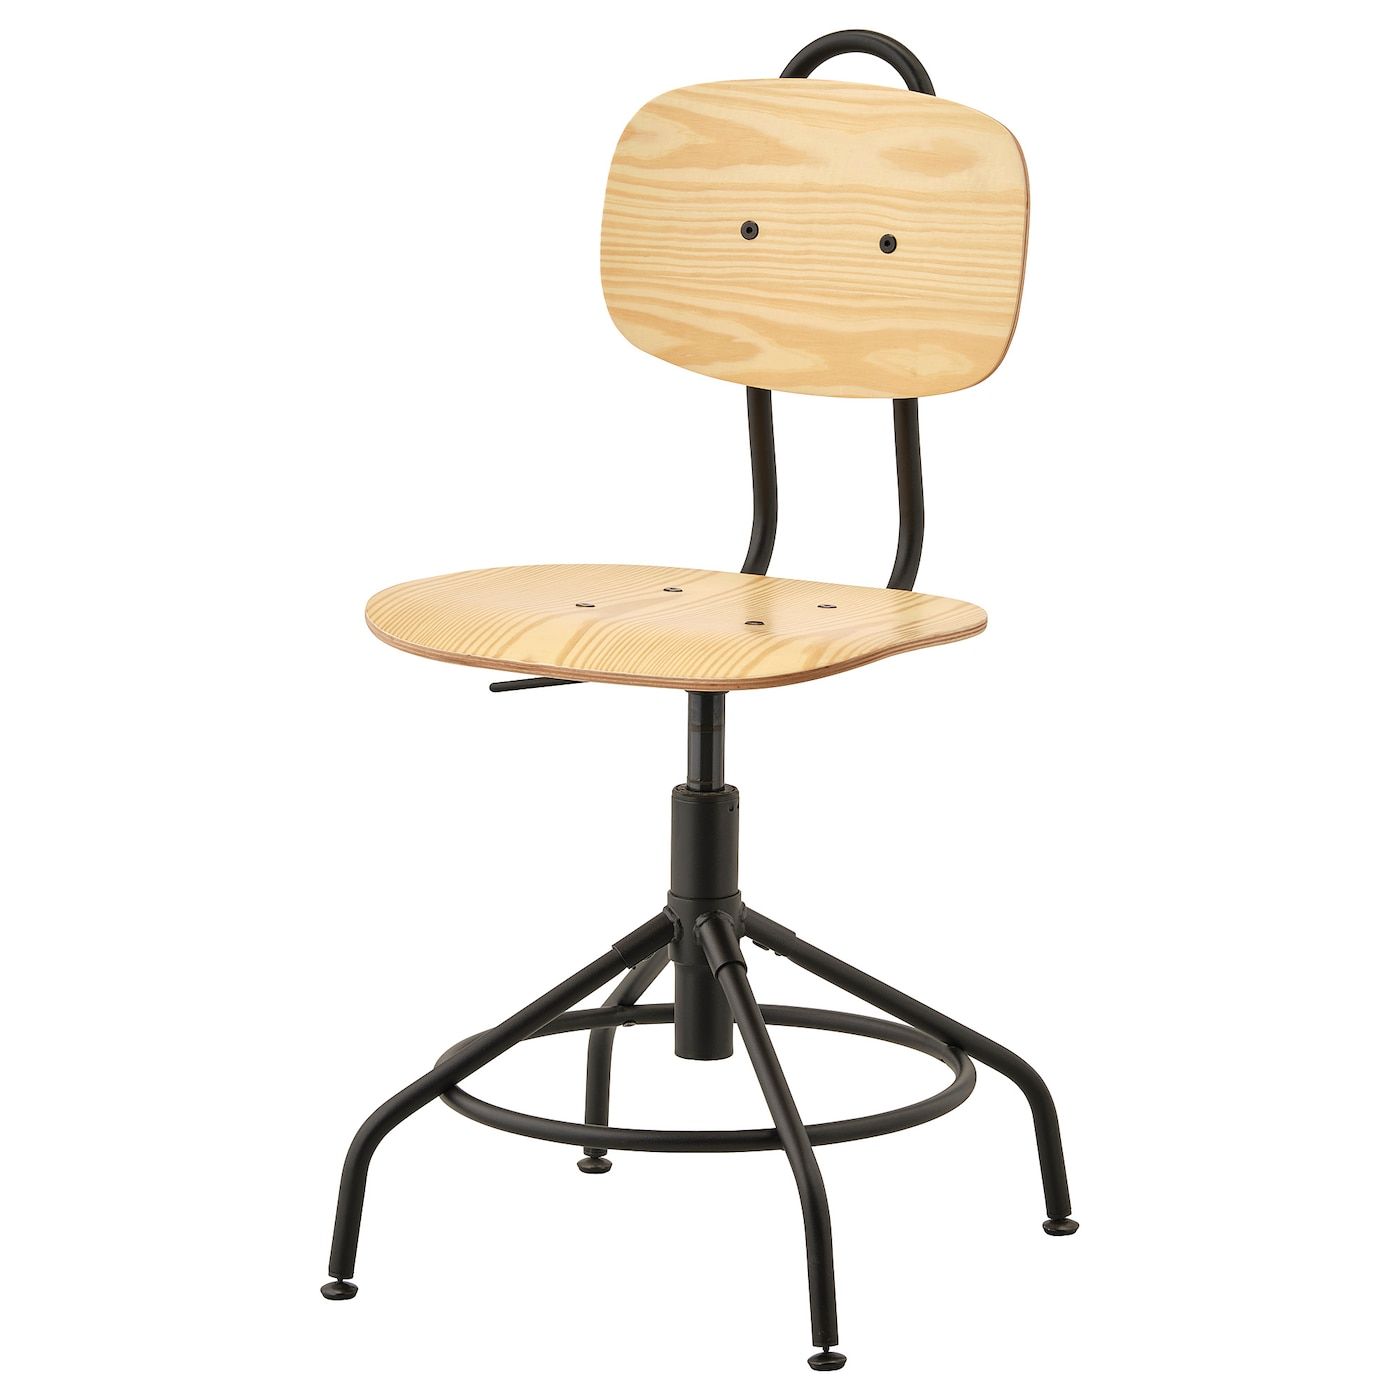 berg-swivel-chair-pine-black__0724693_PE734575_S5